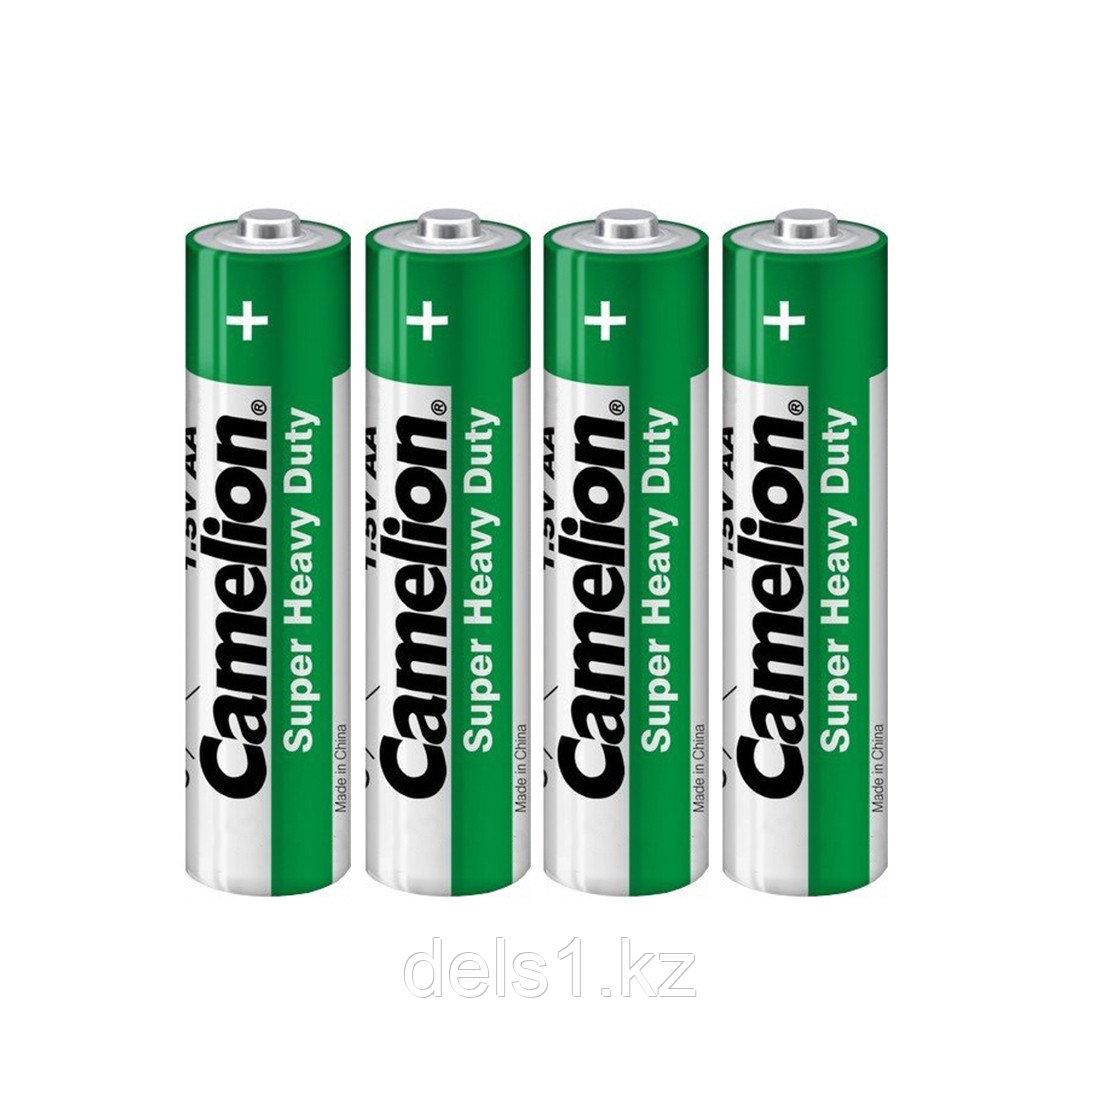 Батарейка, CAMELION, R6P-SP4G, Super Heavy Duty, AA, 1.5V, 4 шт., Плёнка